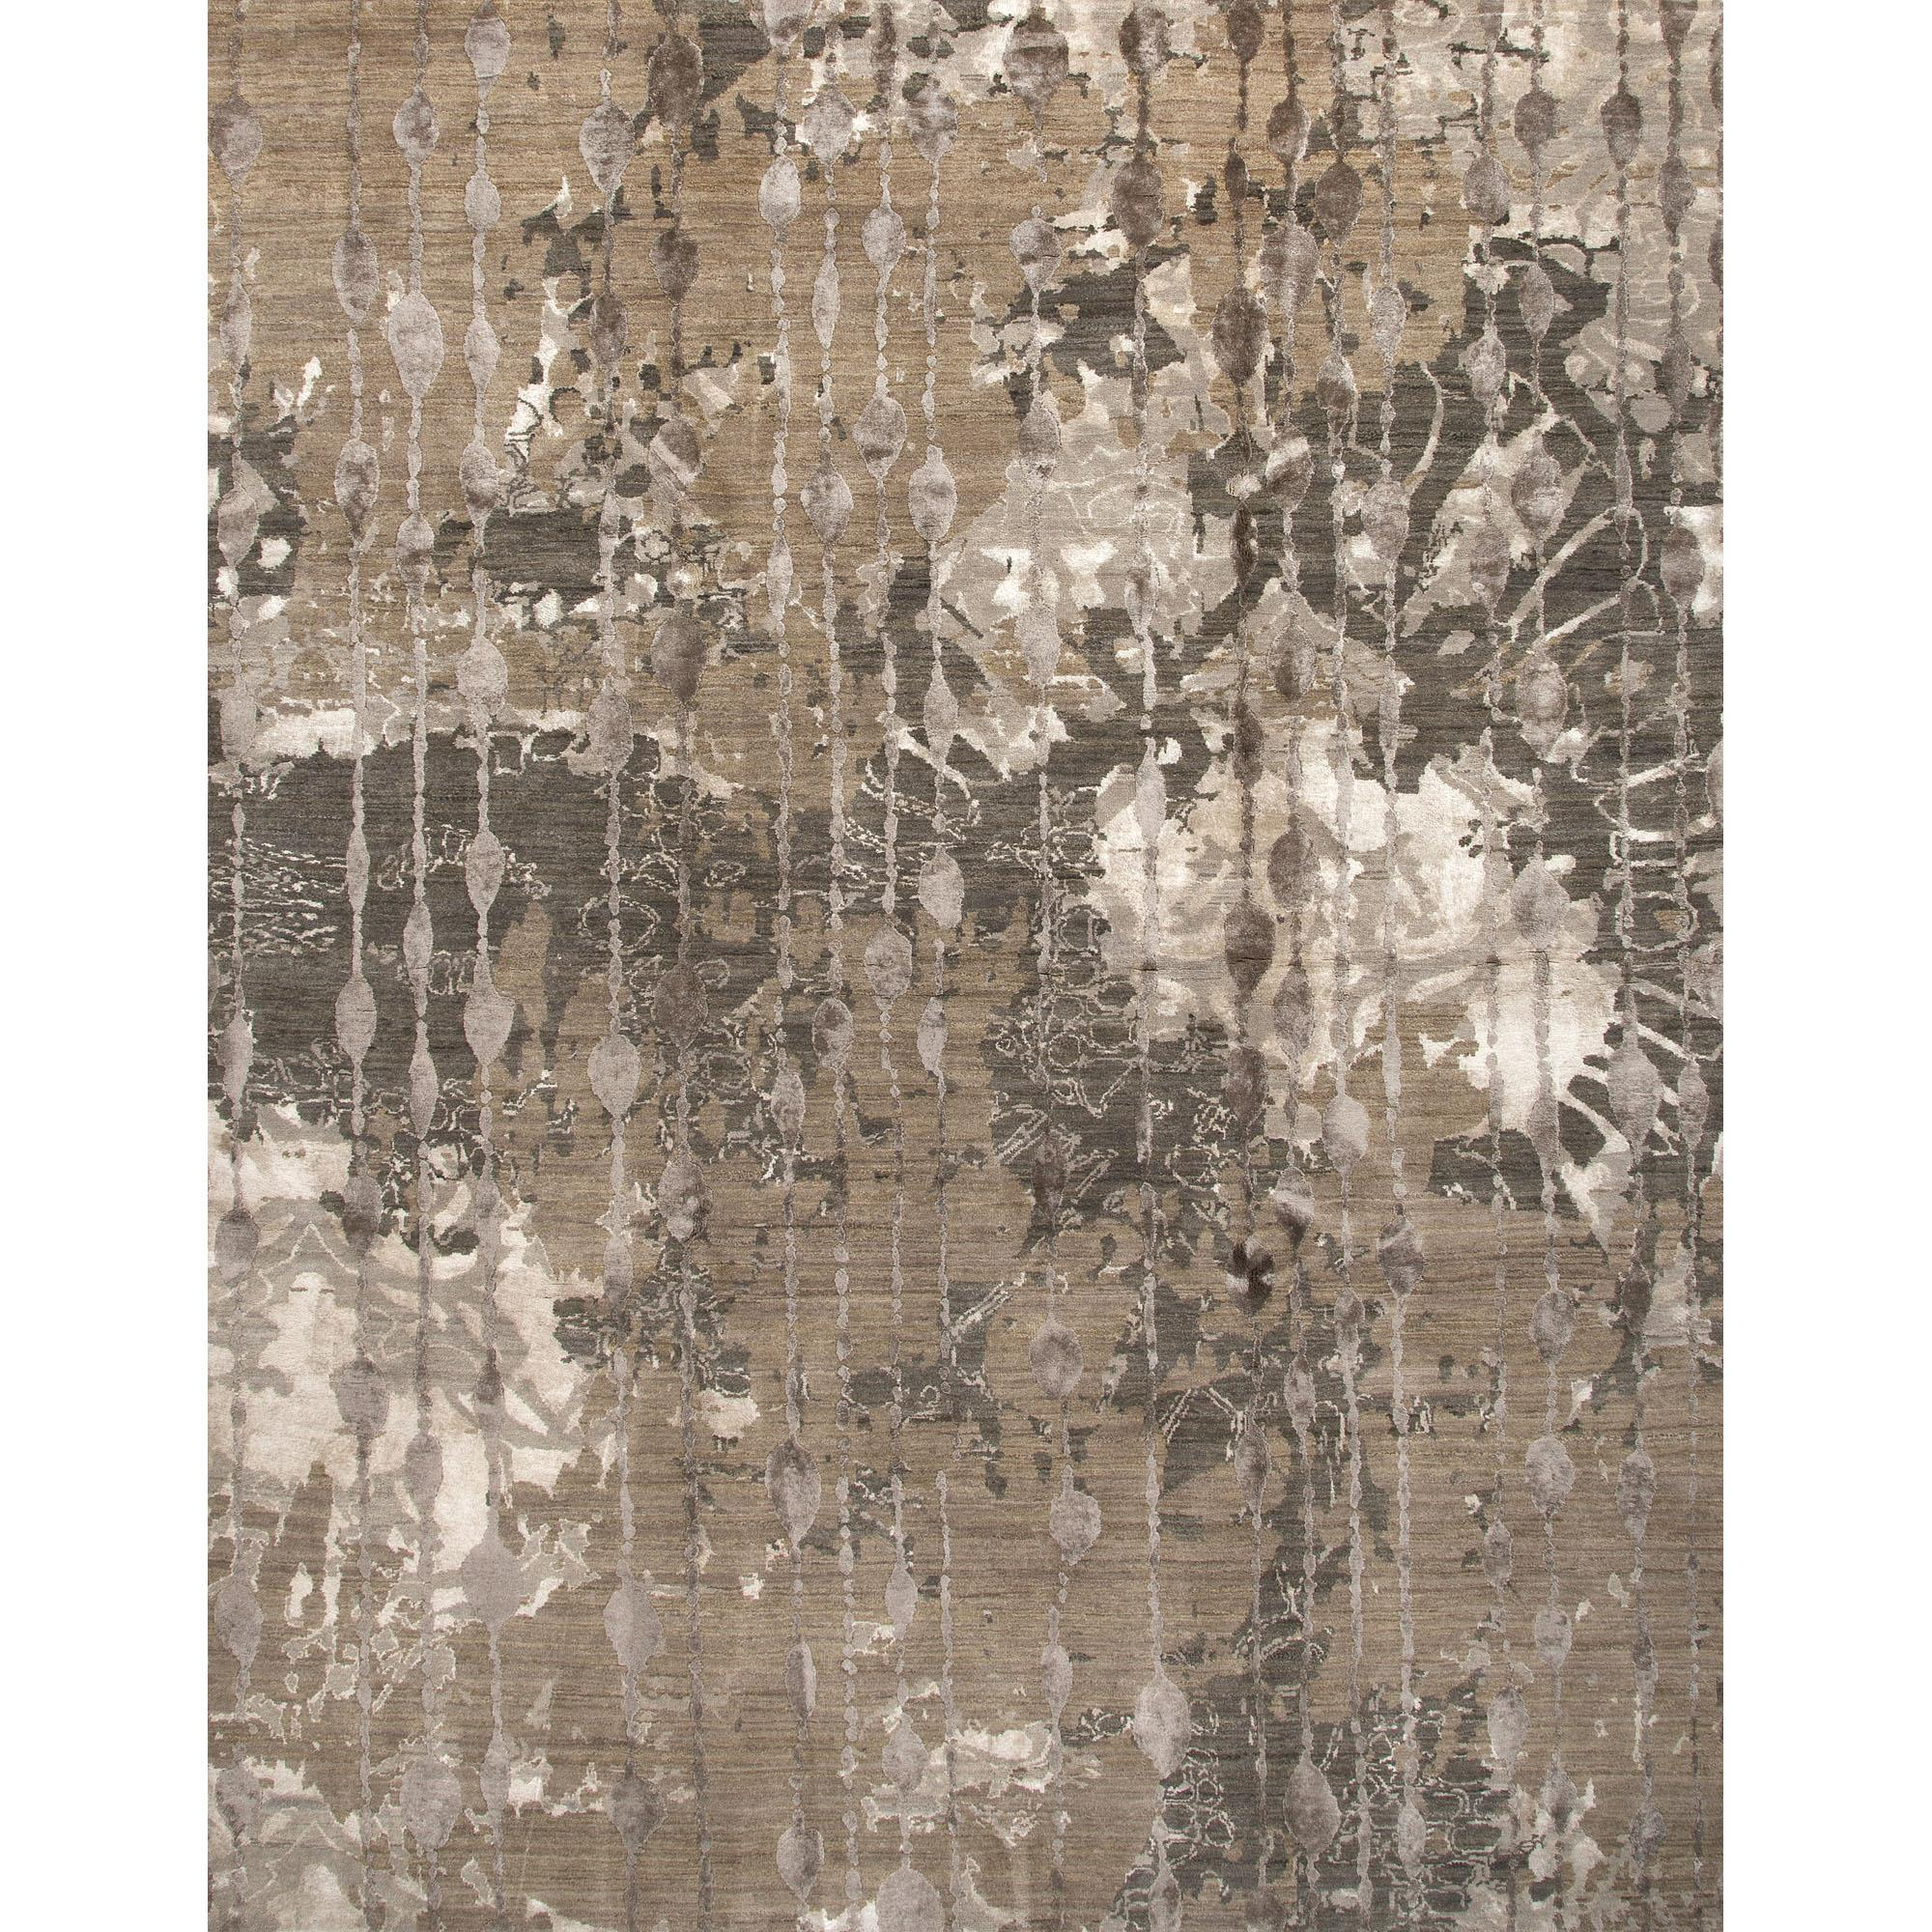 JAIPUR Rugs Connextion By Jenny Jones-global 8 x 10 Rug - Item Number: RUG117072